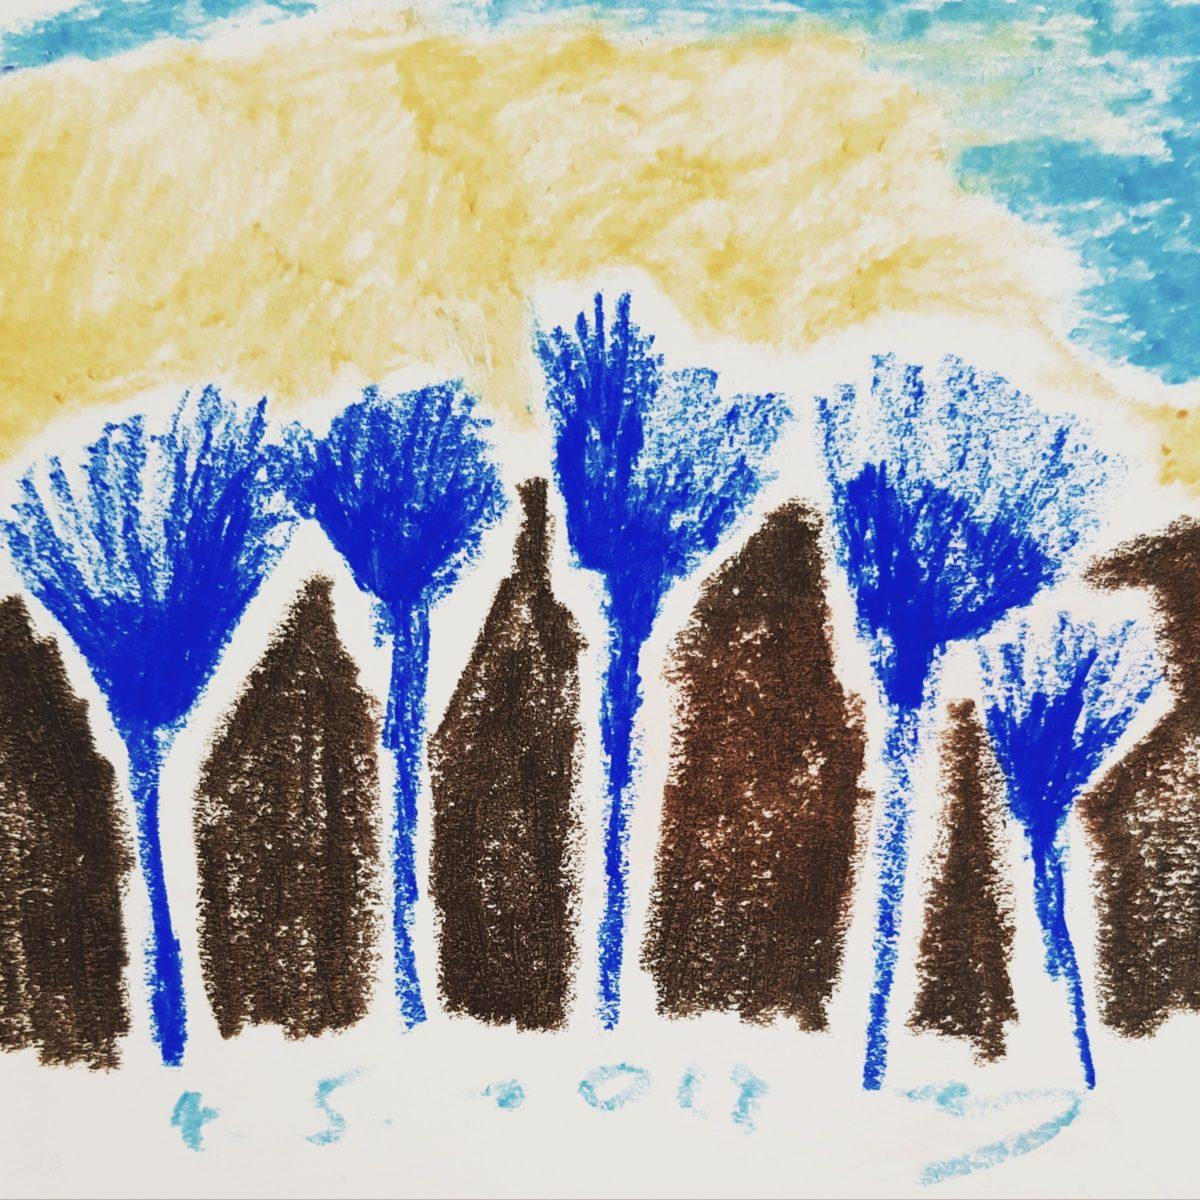 #144: kult, krich & kliima